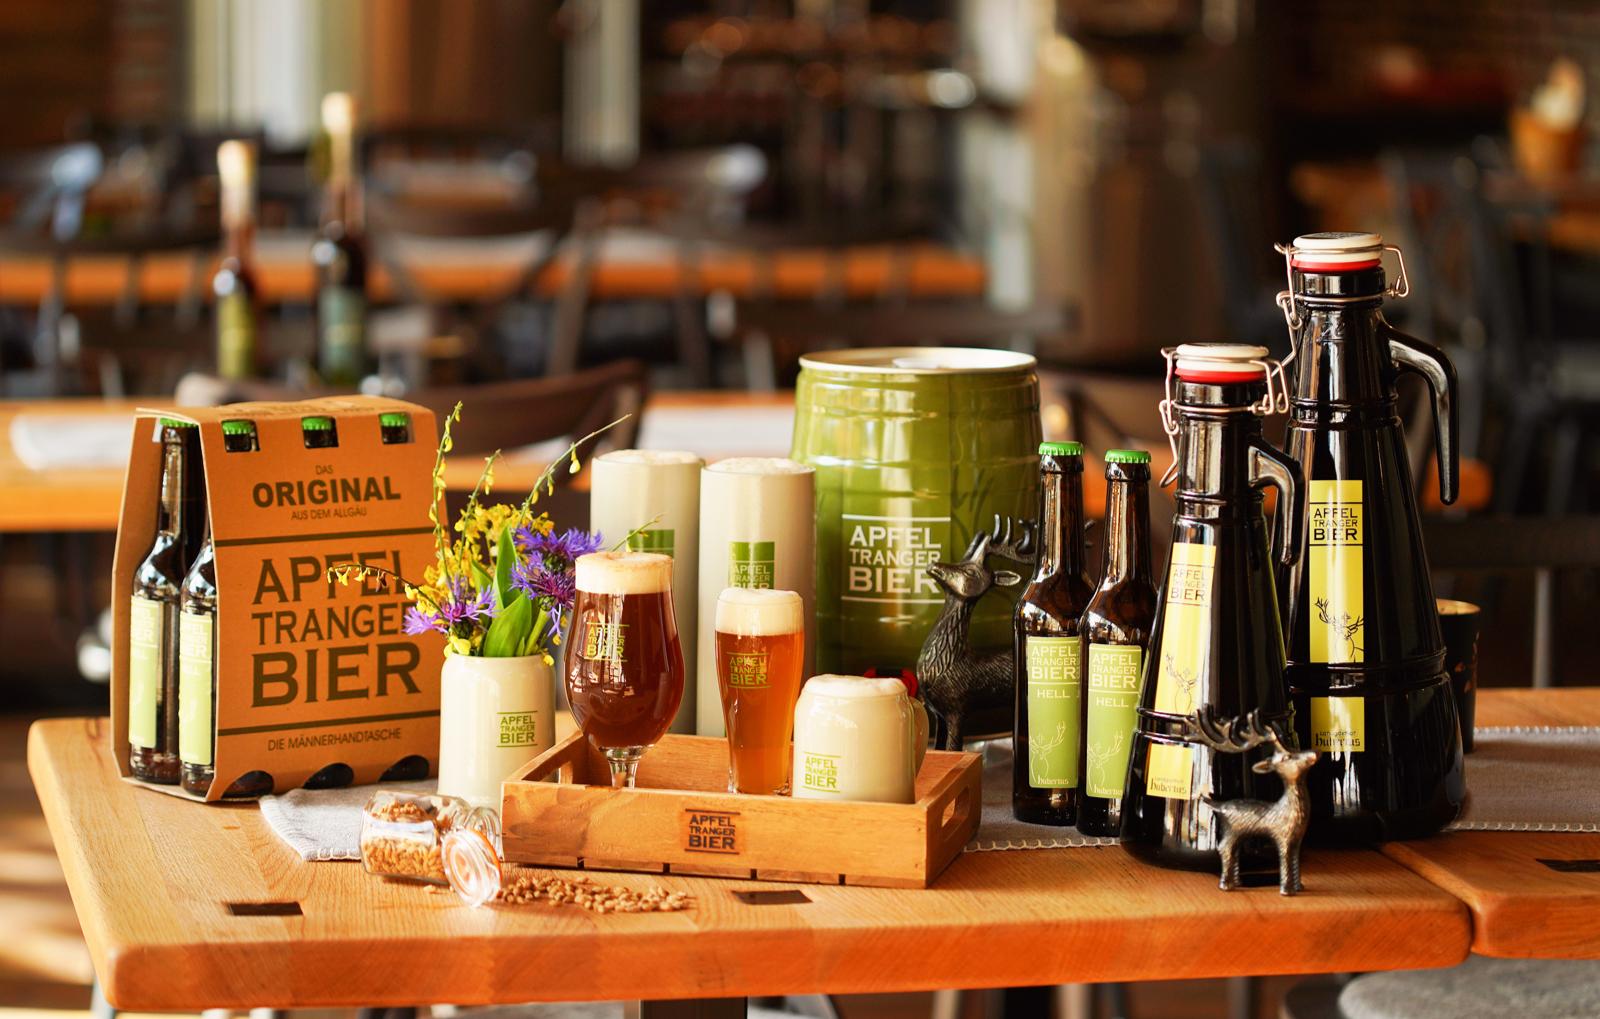 brauereifuehrung-und-bierverkostung-apfeltrang-bg1